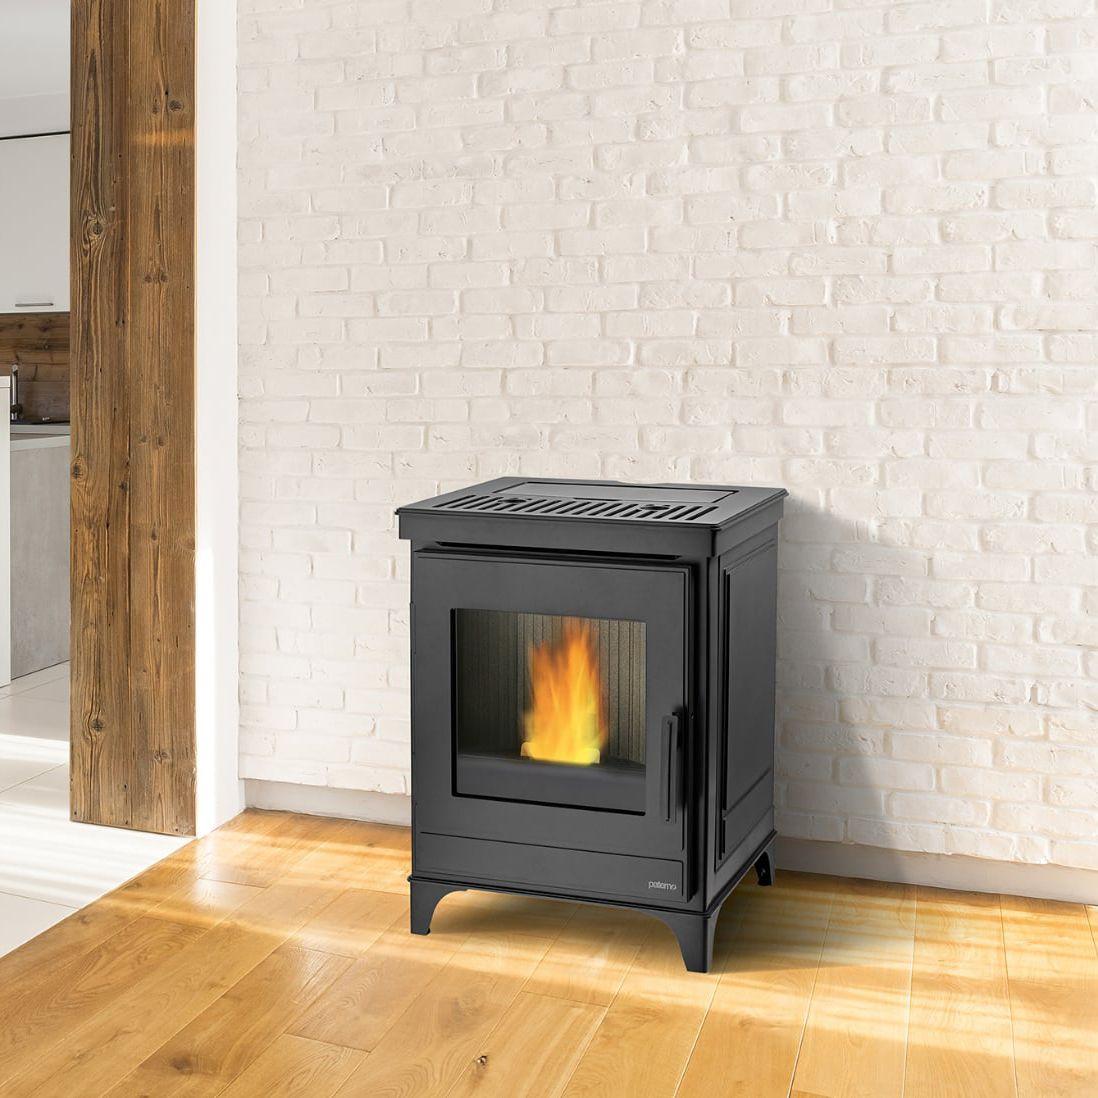 Stufe A Pellet Cassino pellet heating stove - p14 - paterno - steel / cast iron